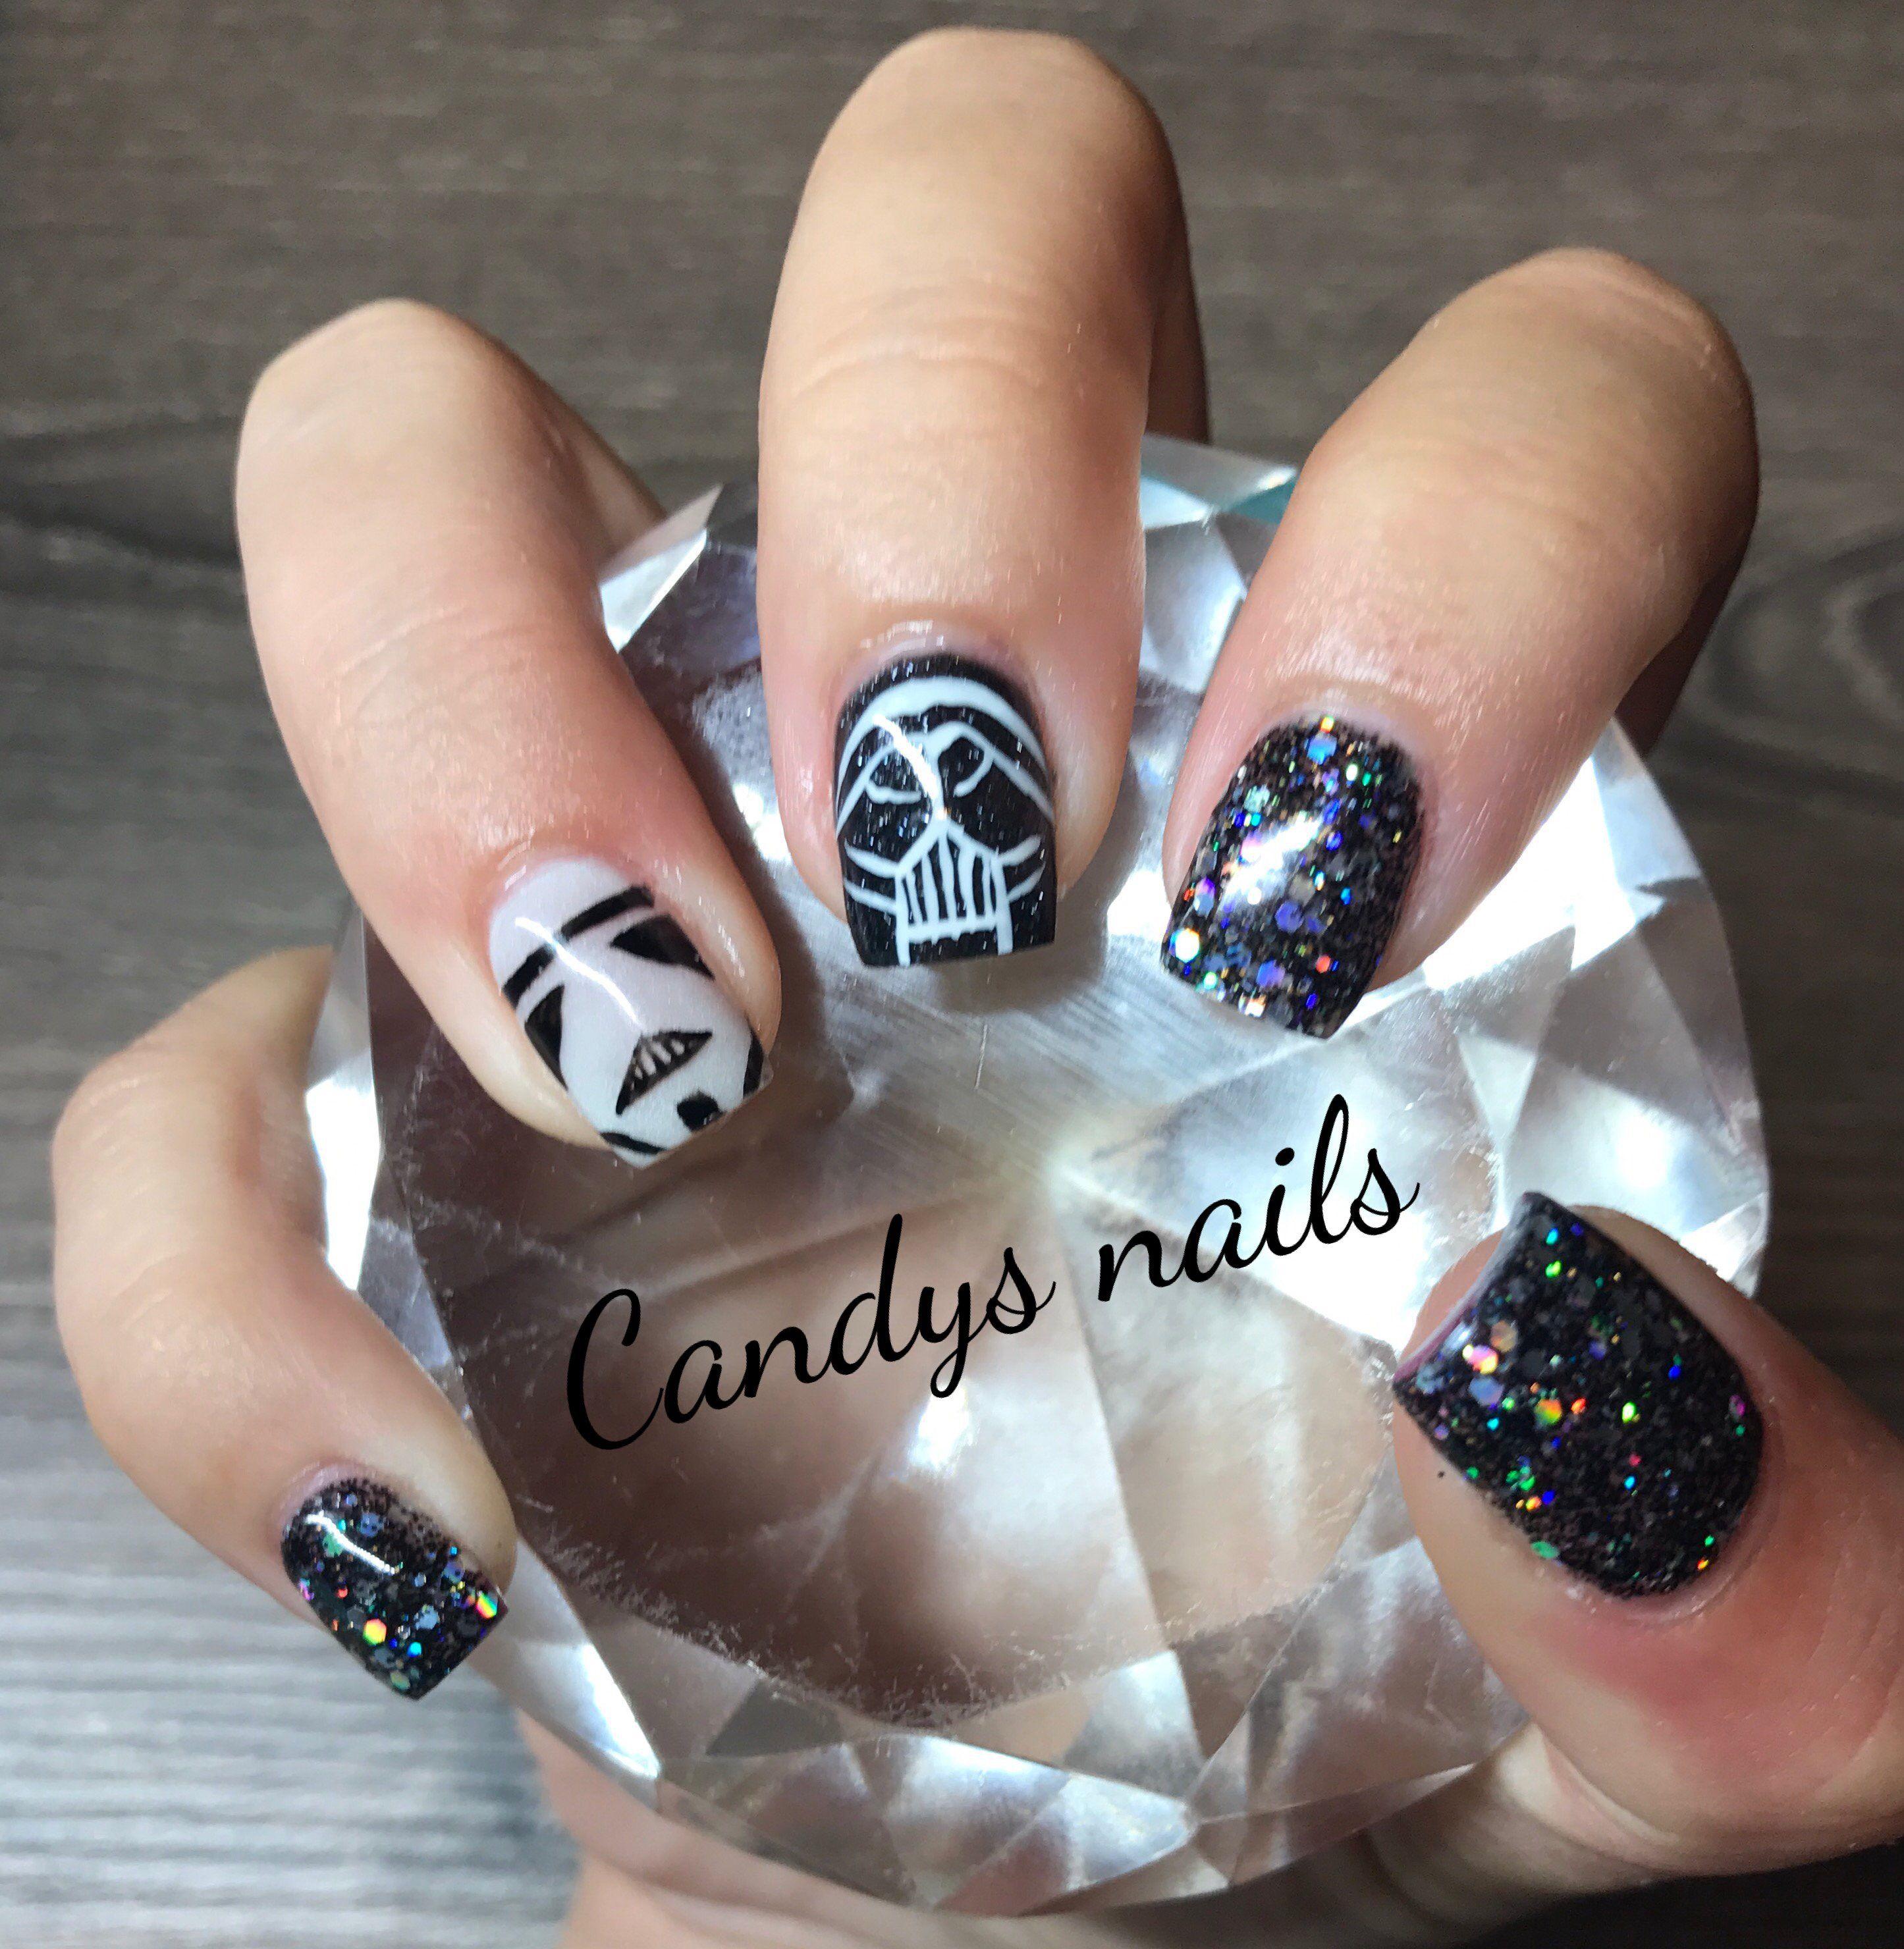 Black Glitter Star Wars Acrylic Nails Nails Acrylic Nails All Things Beauty